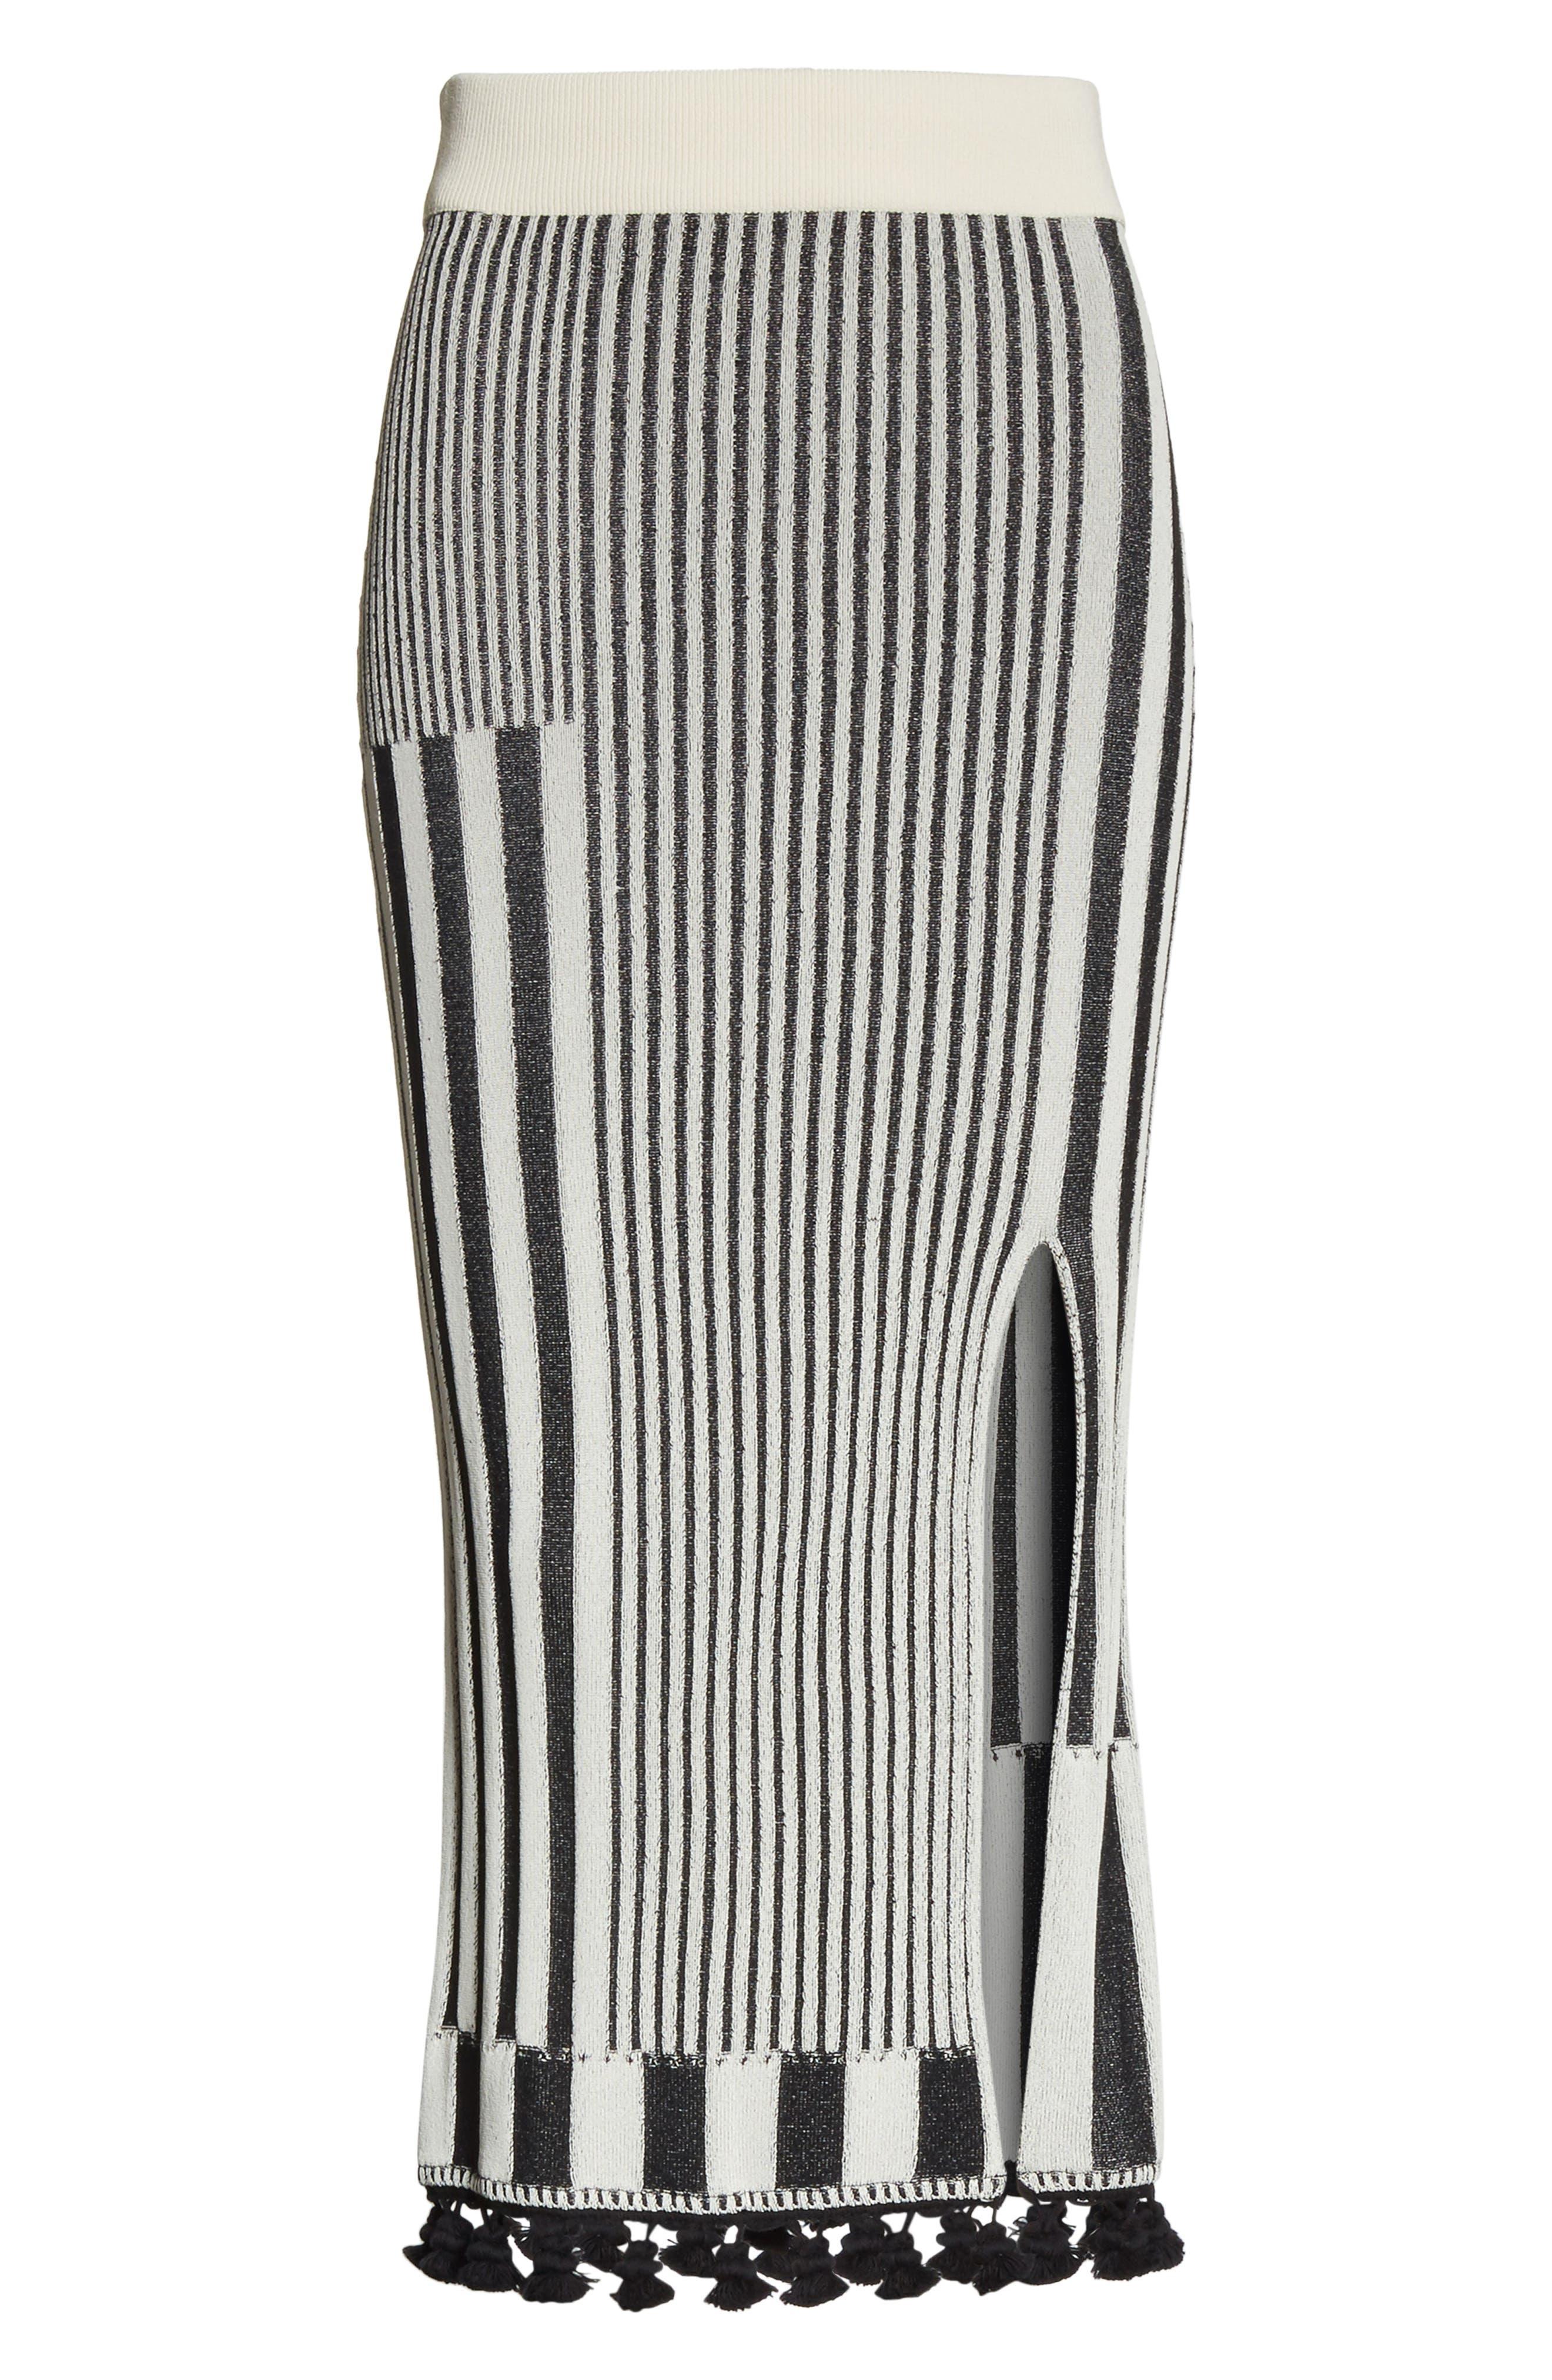 Tassel Trim Stripe Pencil Skirt,                             Alternate thumbnail 6, color,                             001